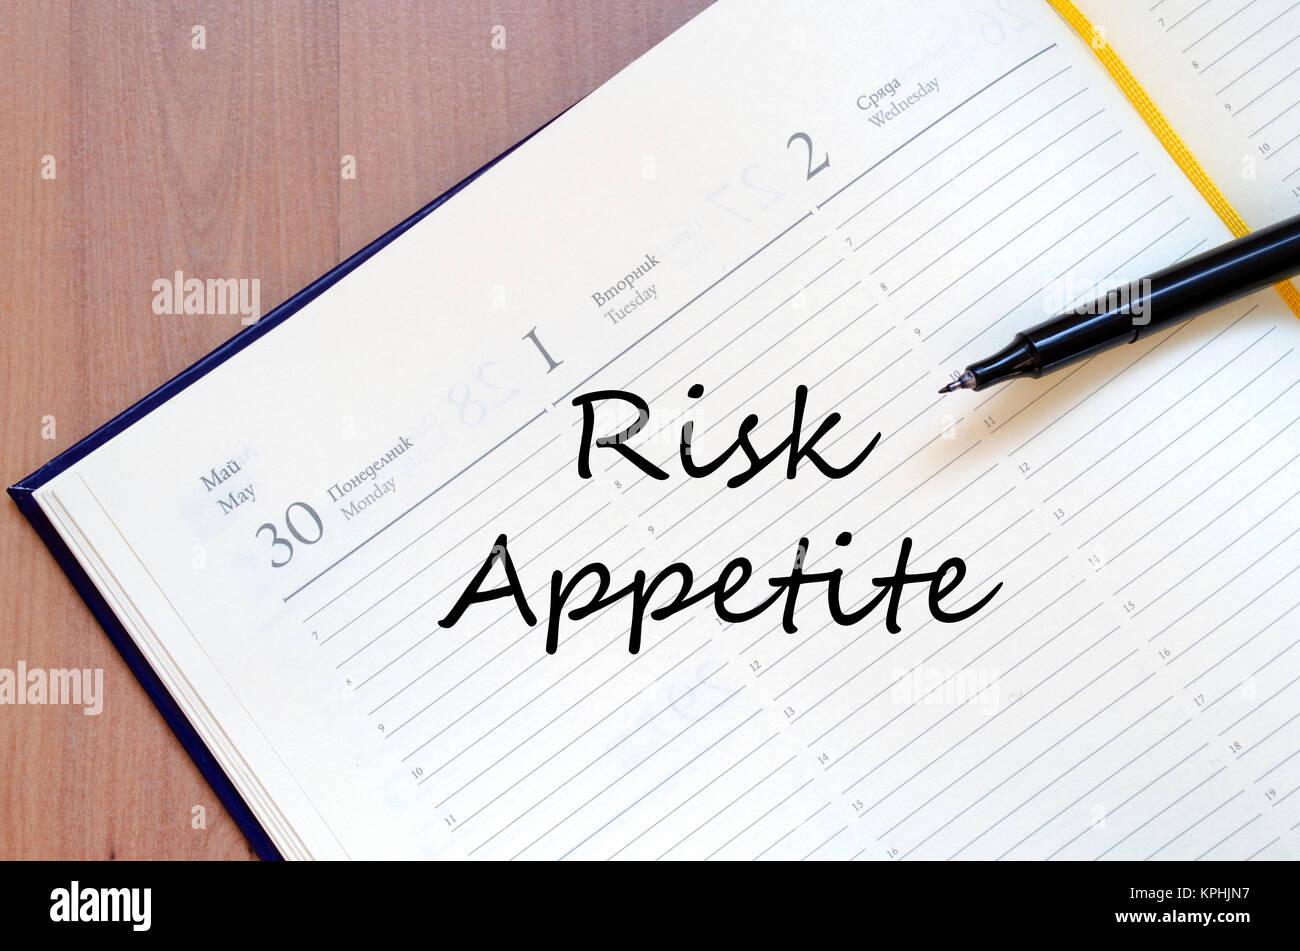 Risk appetite write on notebook Stock Photo